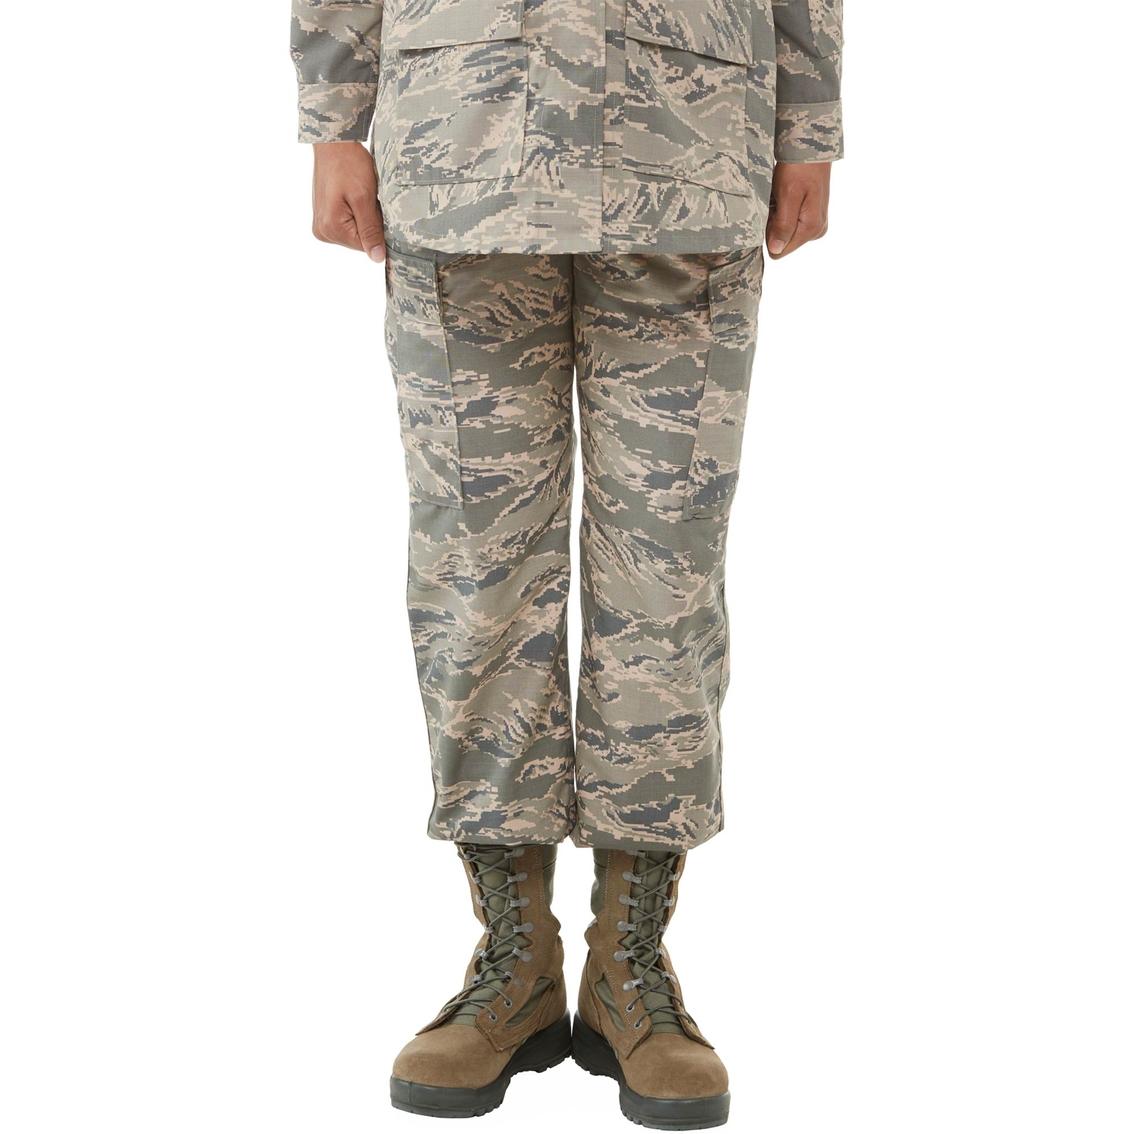 Airman Battle Uniform - Wikipedia